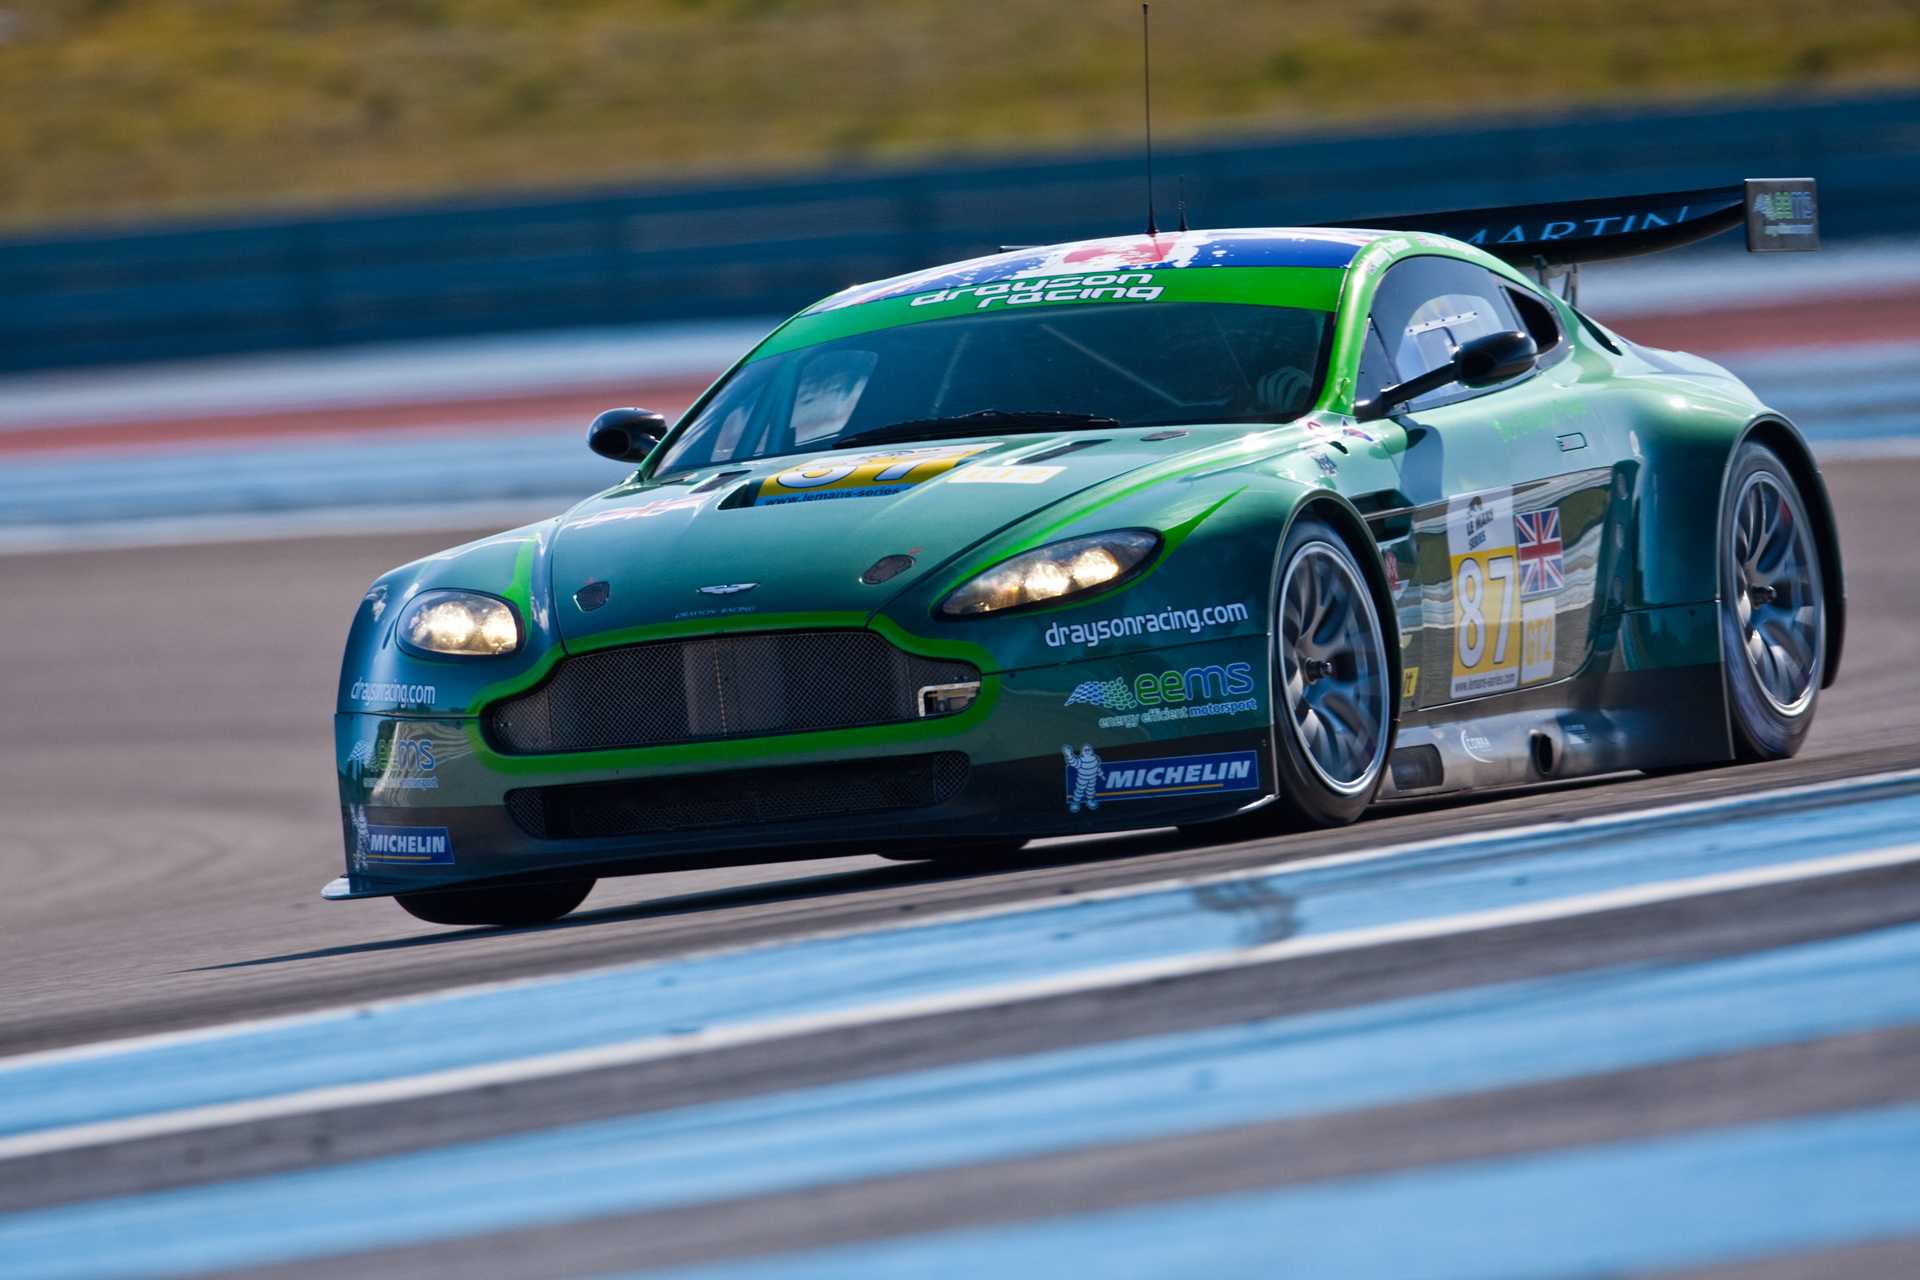 Aston Martin Vantage GT2 Pics, Vehicles Collection